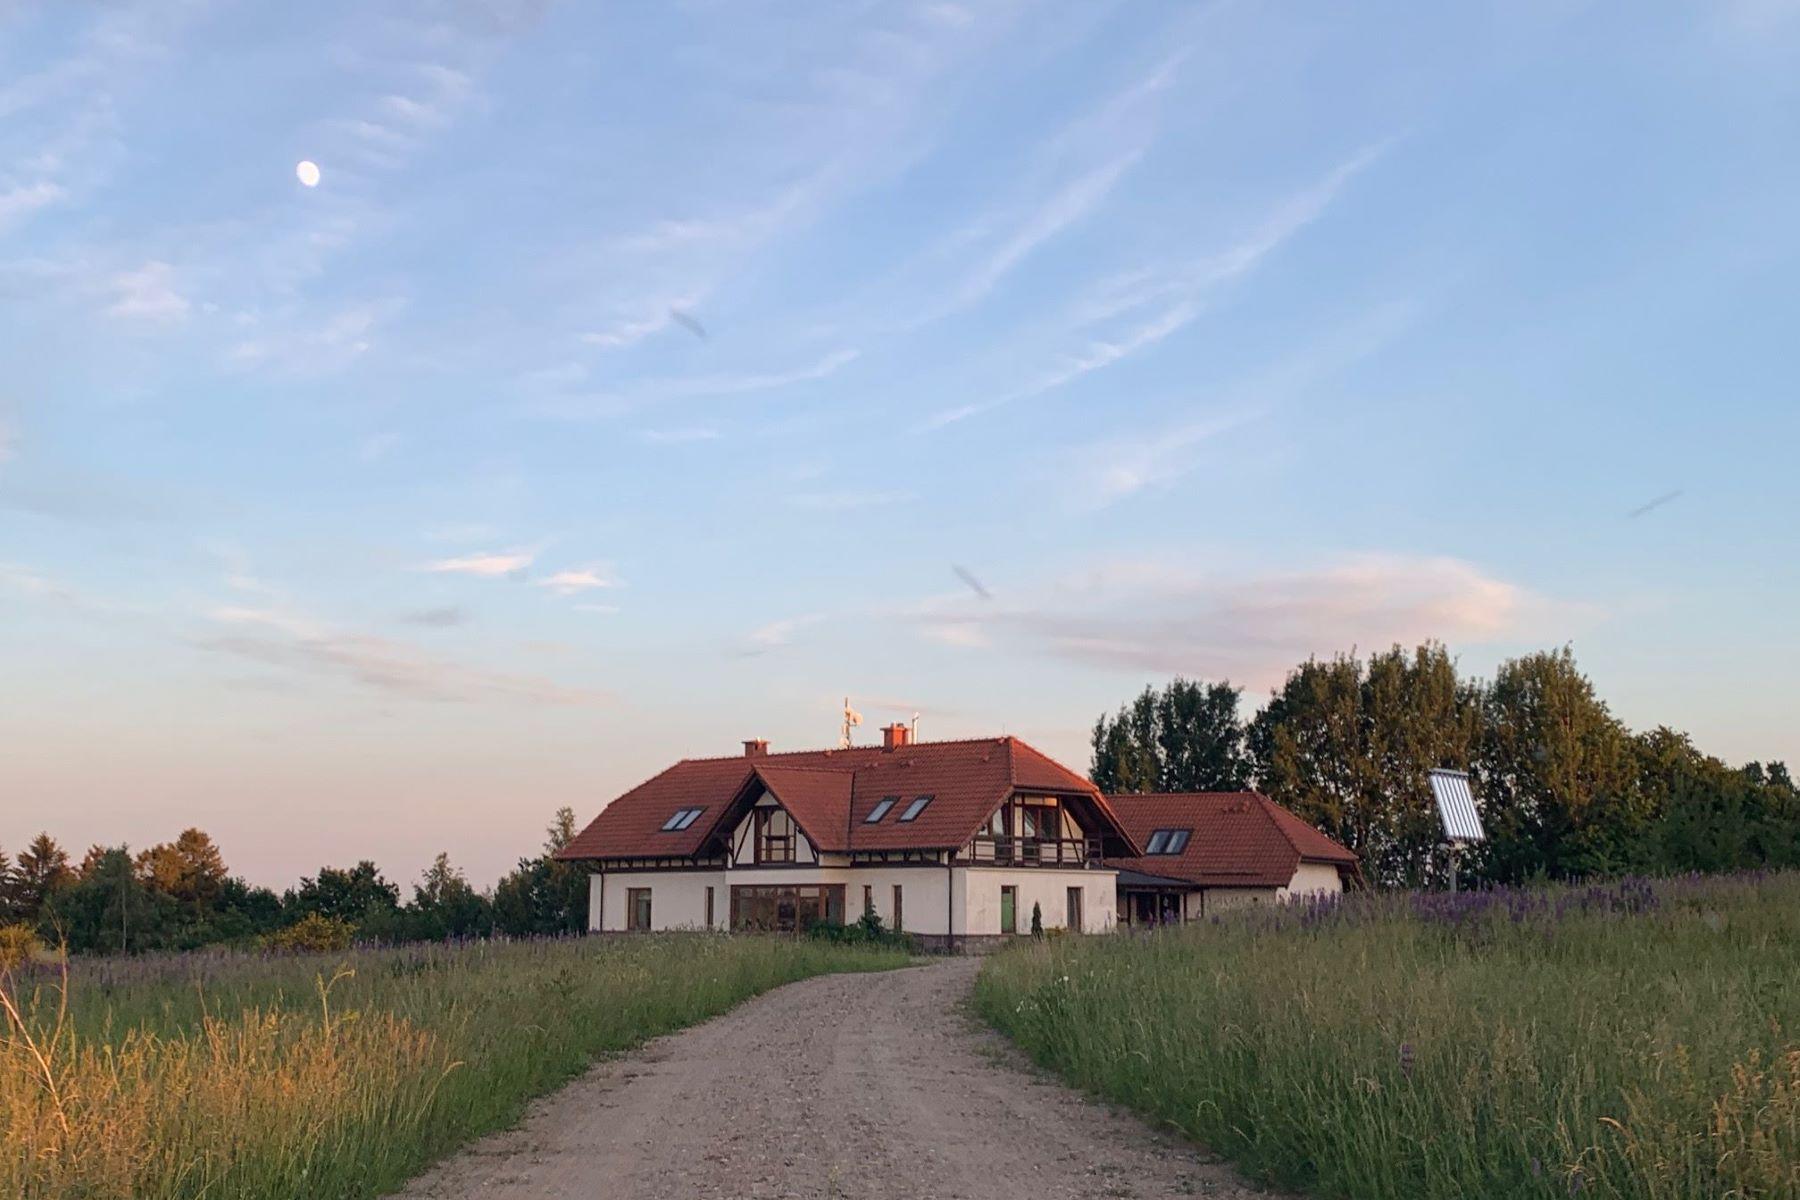 Ferme / Ranch / Plantation pour l Vente à Czeczewo Zacisze Other Pomeranian, Pomeranian 84-208 Pologne